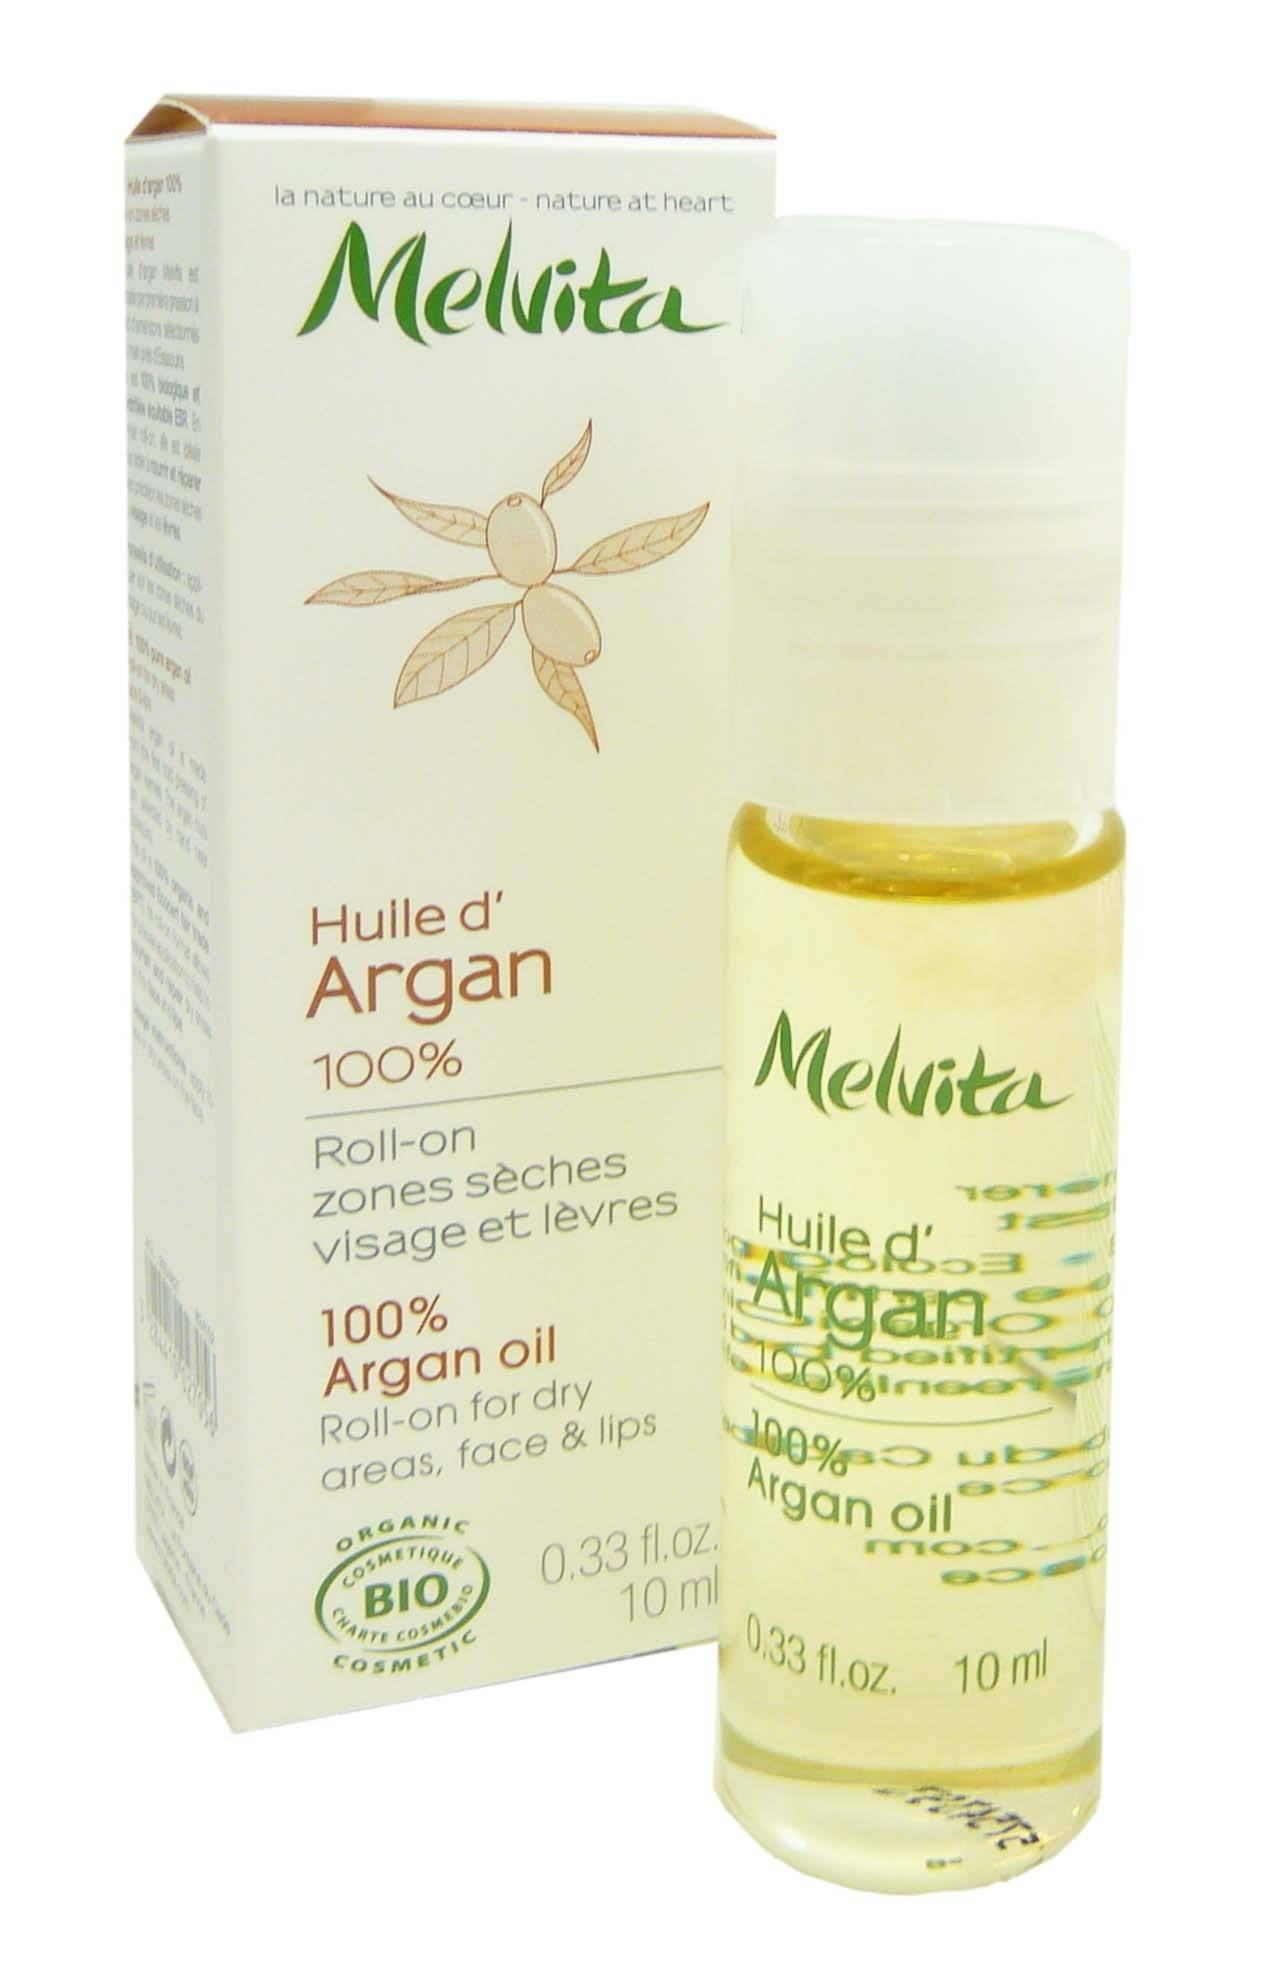 Melvita roll on huile d'argan 100% 10ml